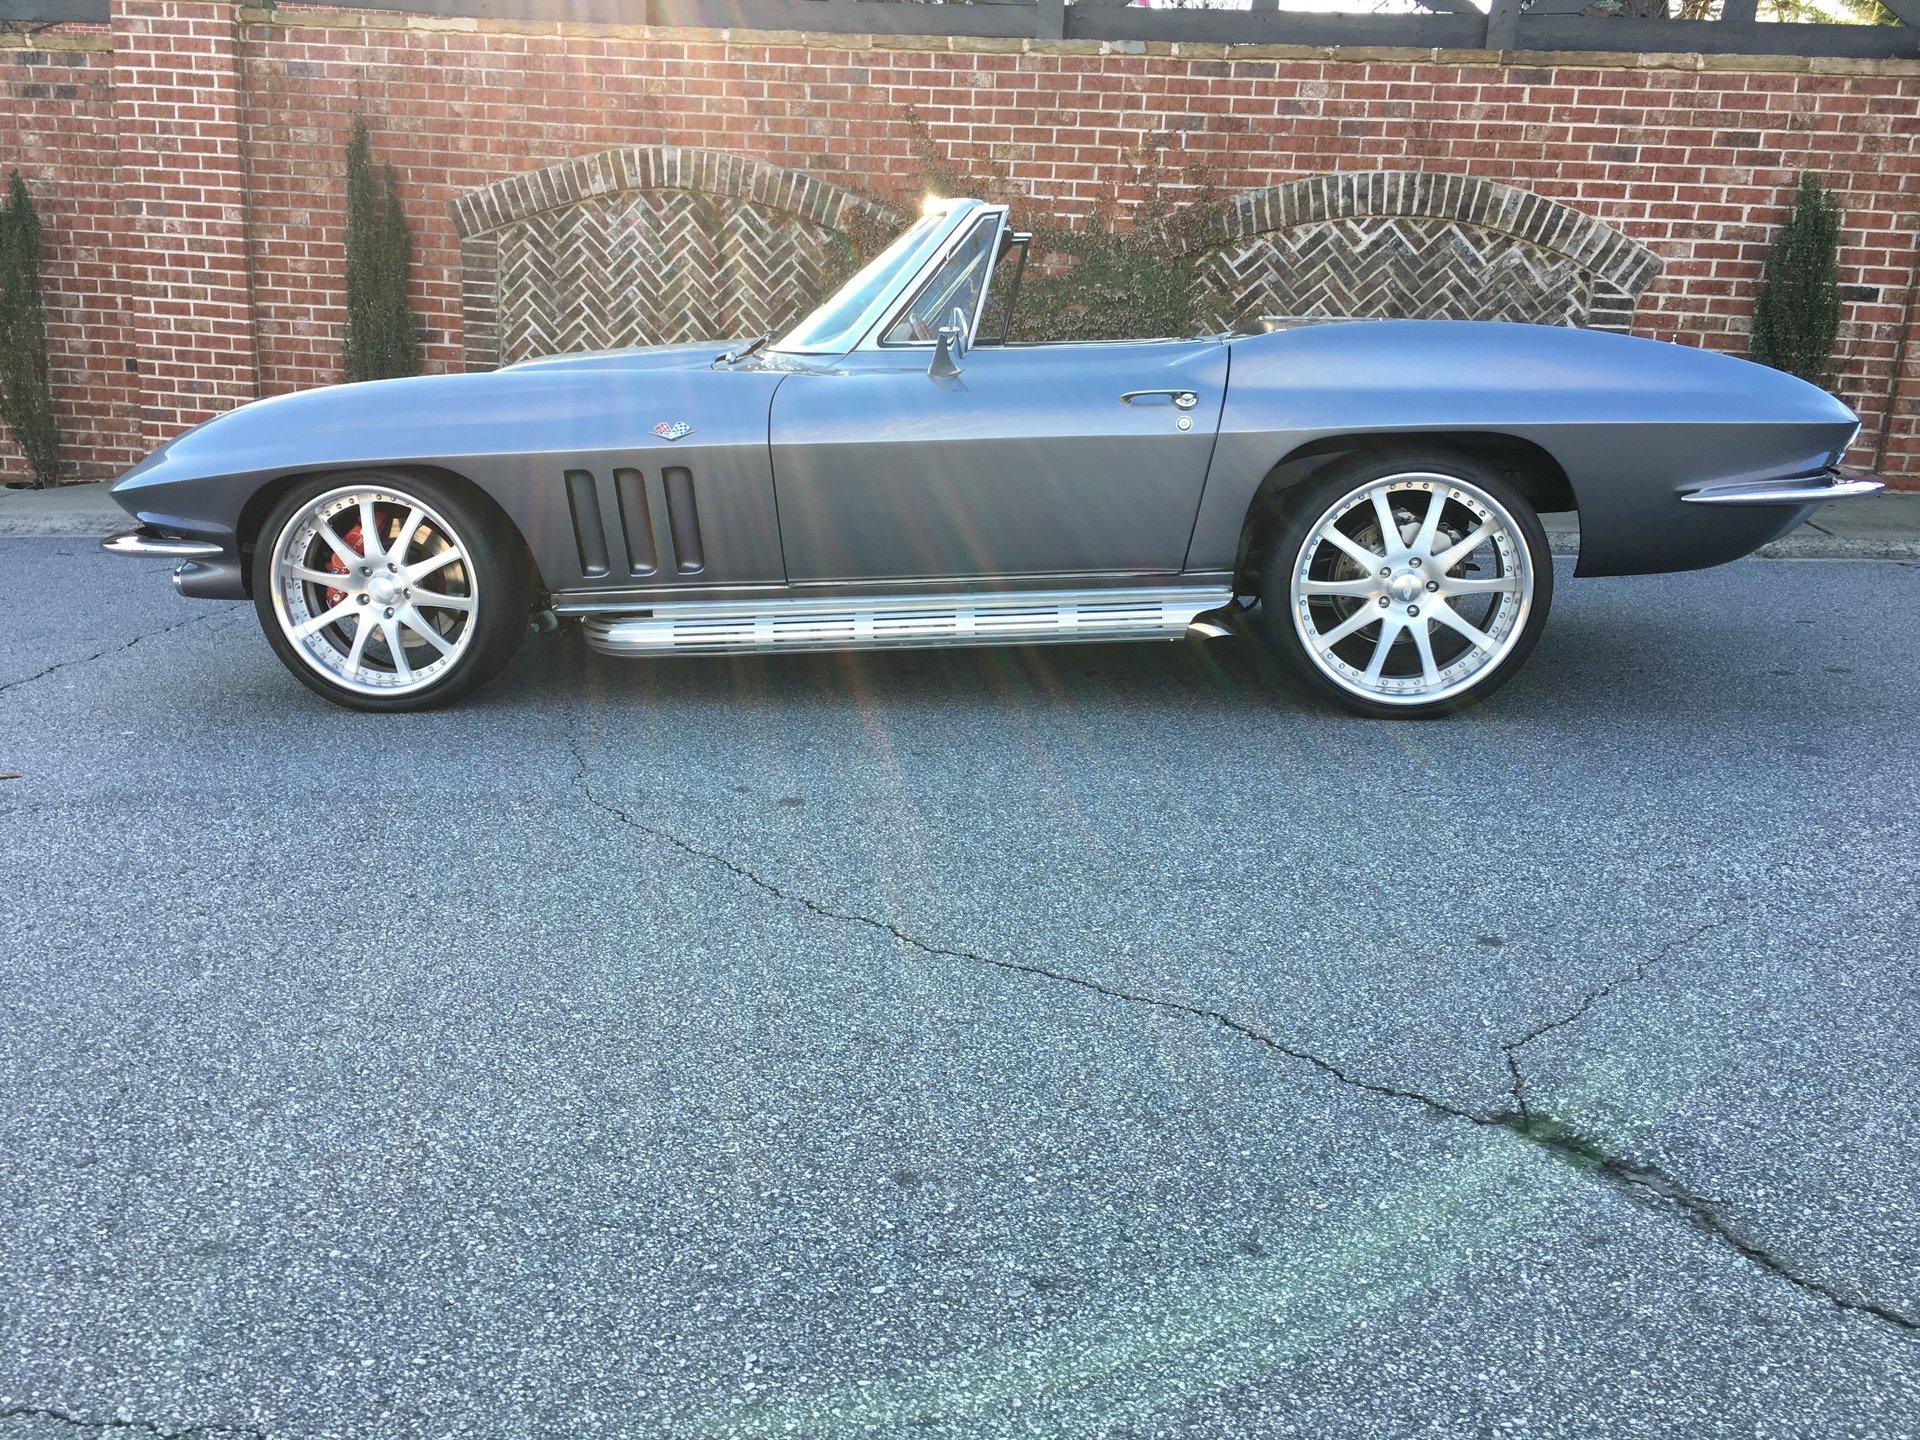 1966 Chevrolet Corvette Gaa Classic Cars Chevy Stingray 604893c281ee7 Hd